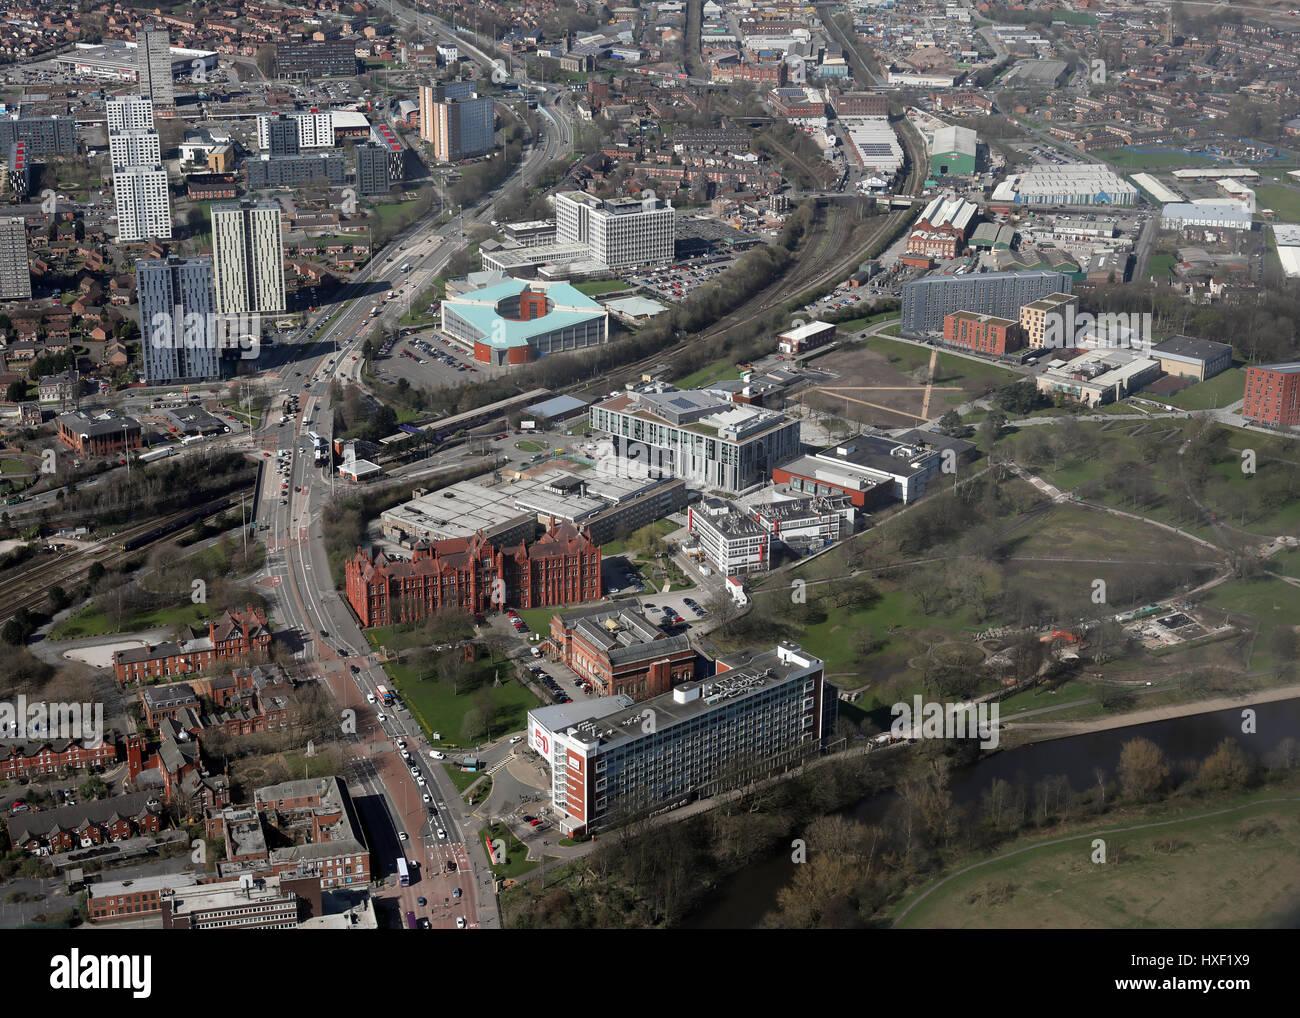 aerial view of Salford University, UK - Stock Image